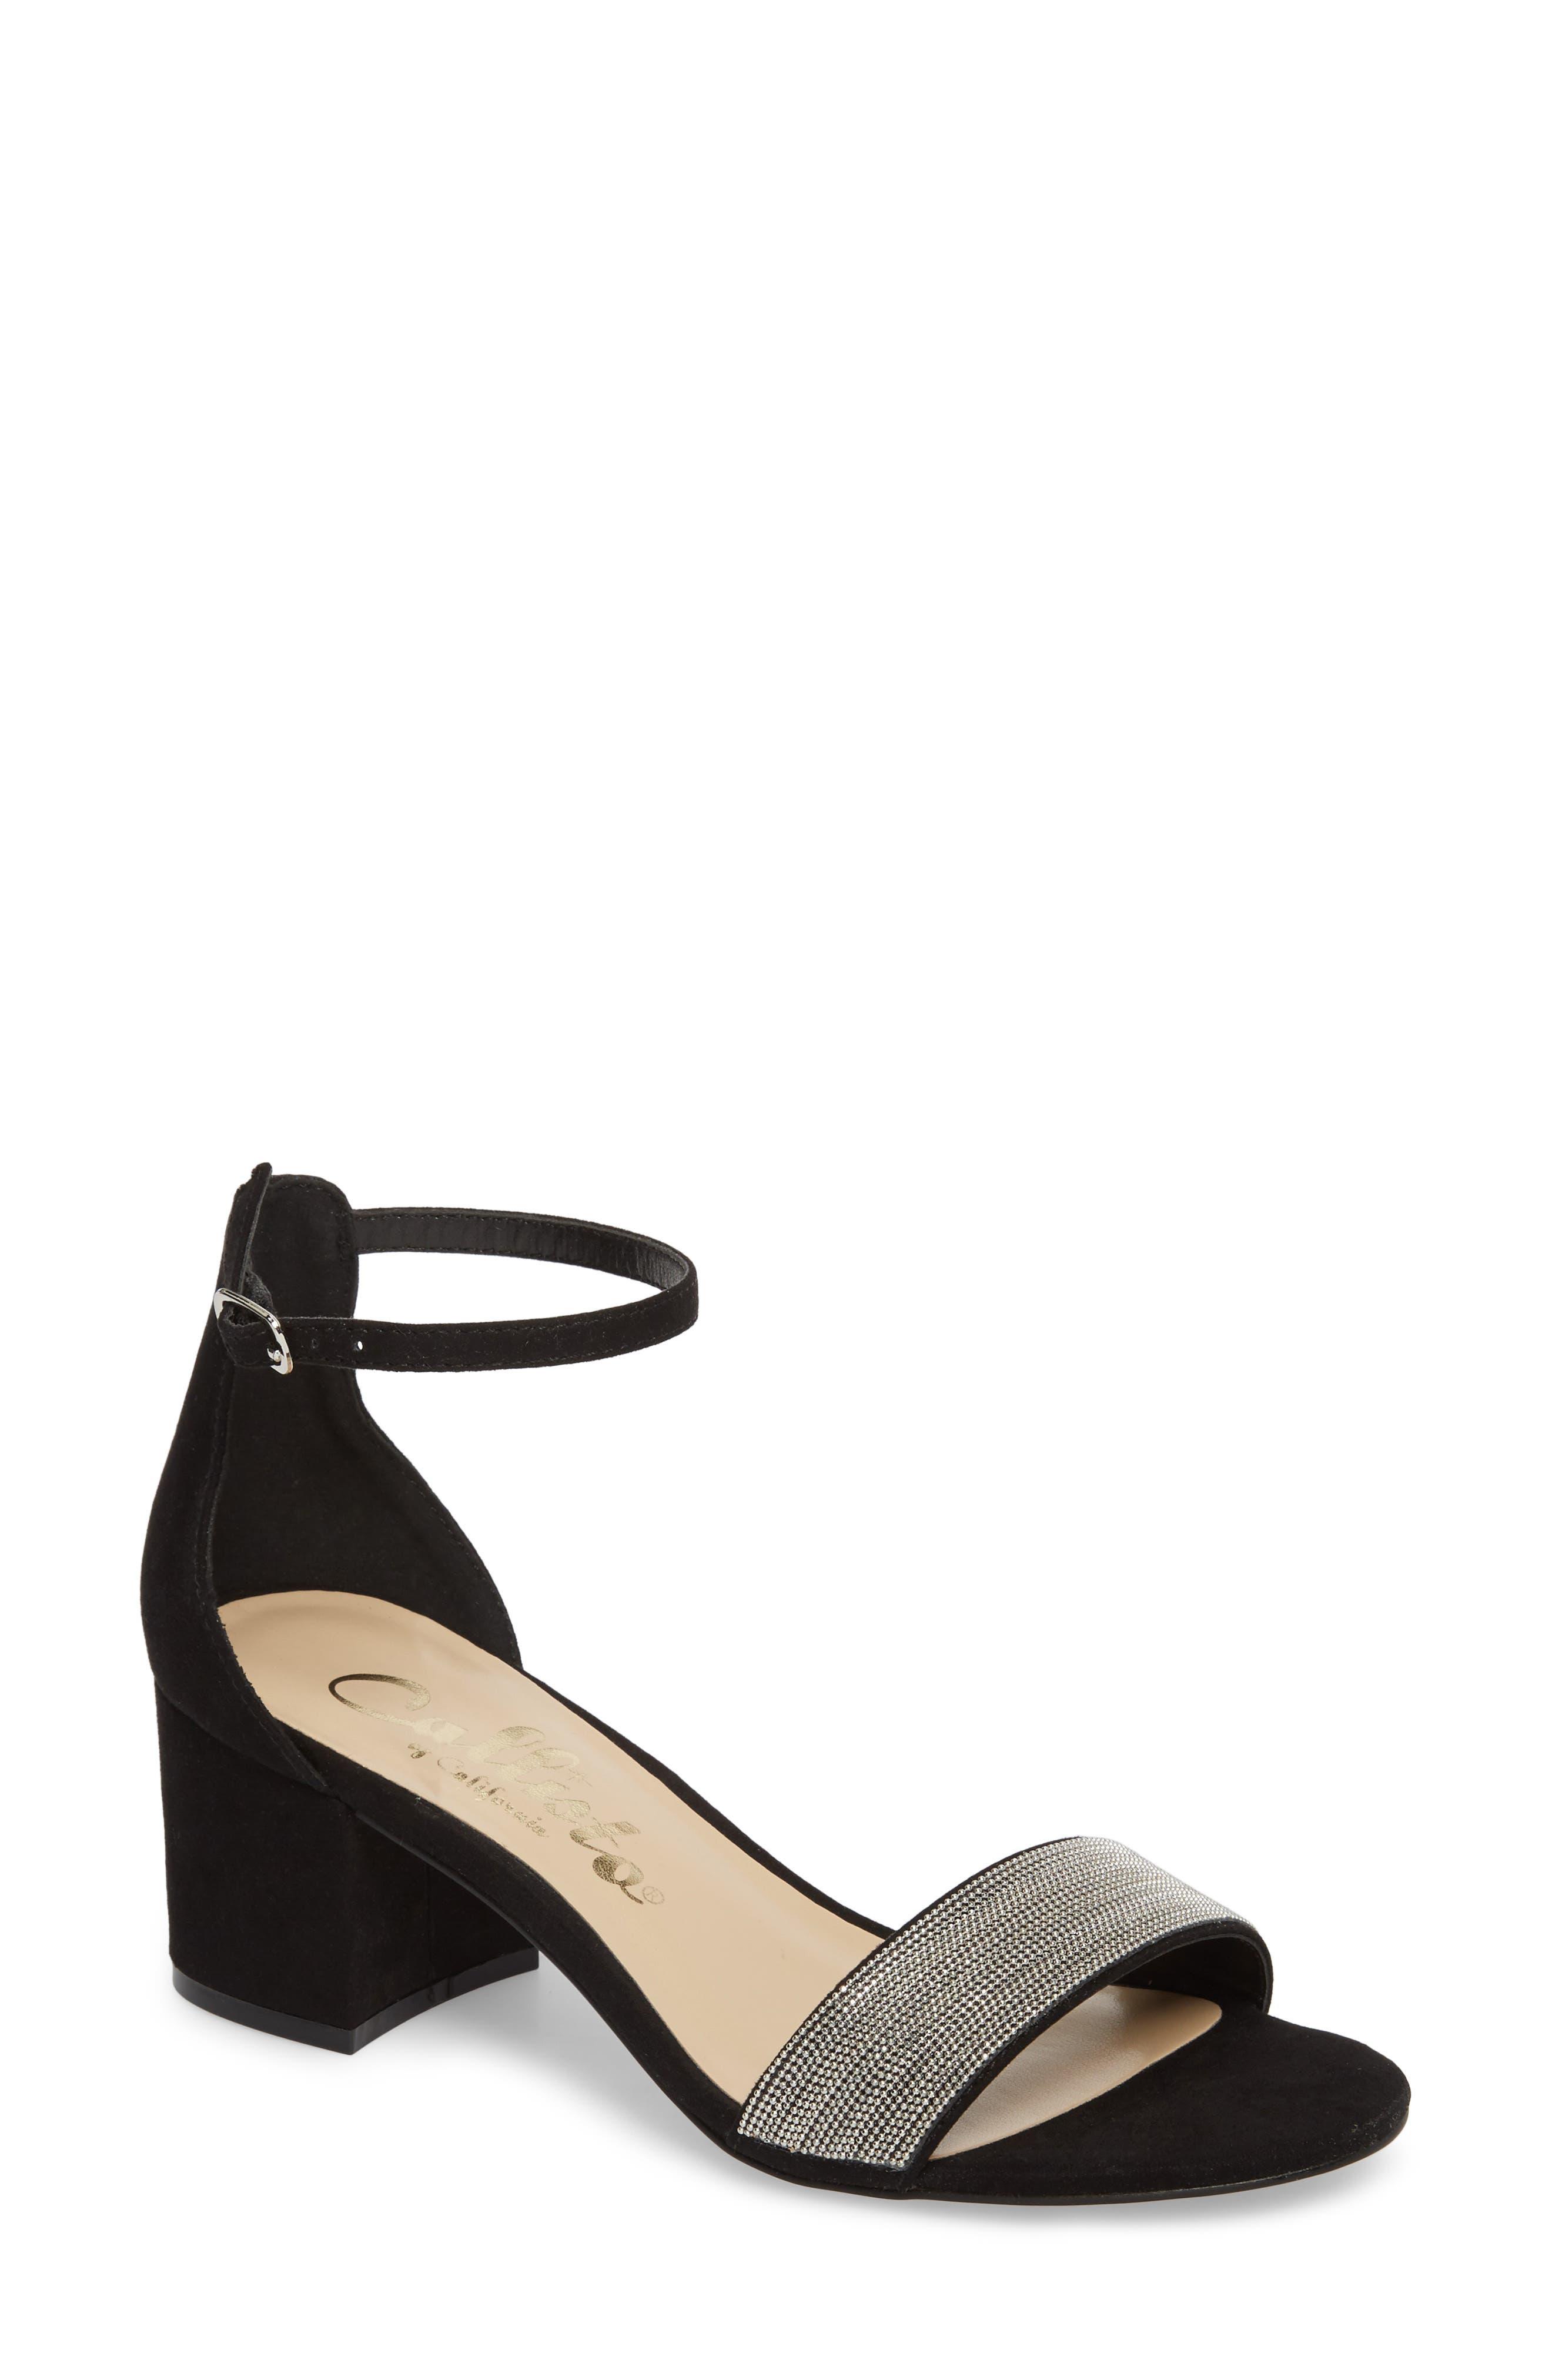 Jazmine Ankle Strap Sandal,                             Main thumbnail 1, color,                             Black Suede